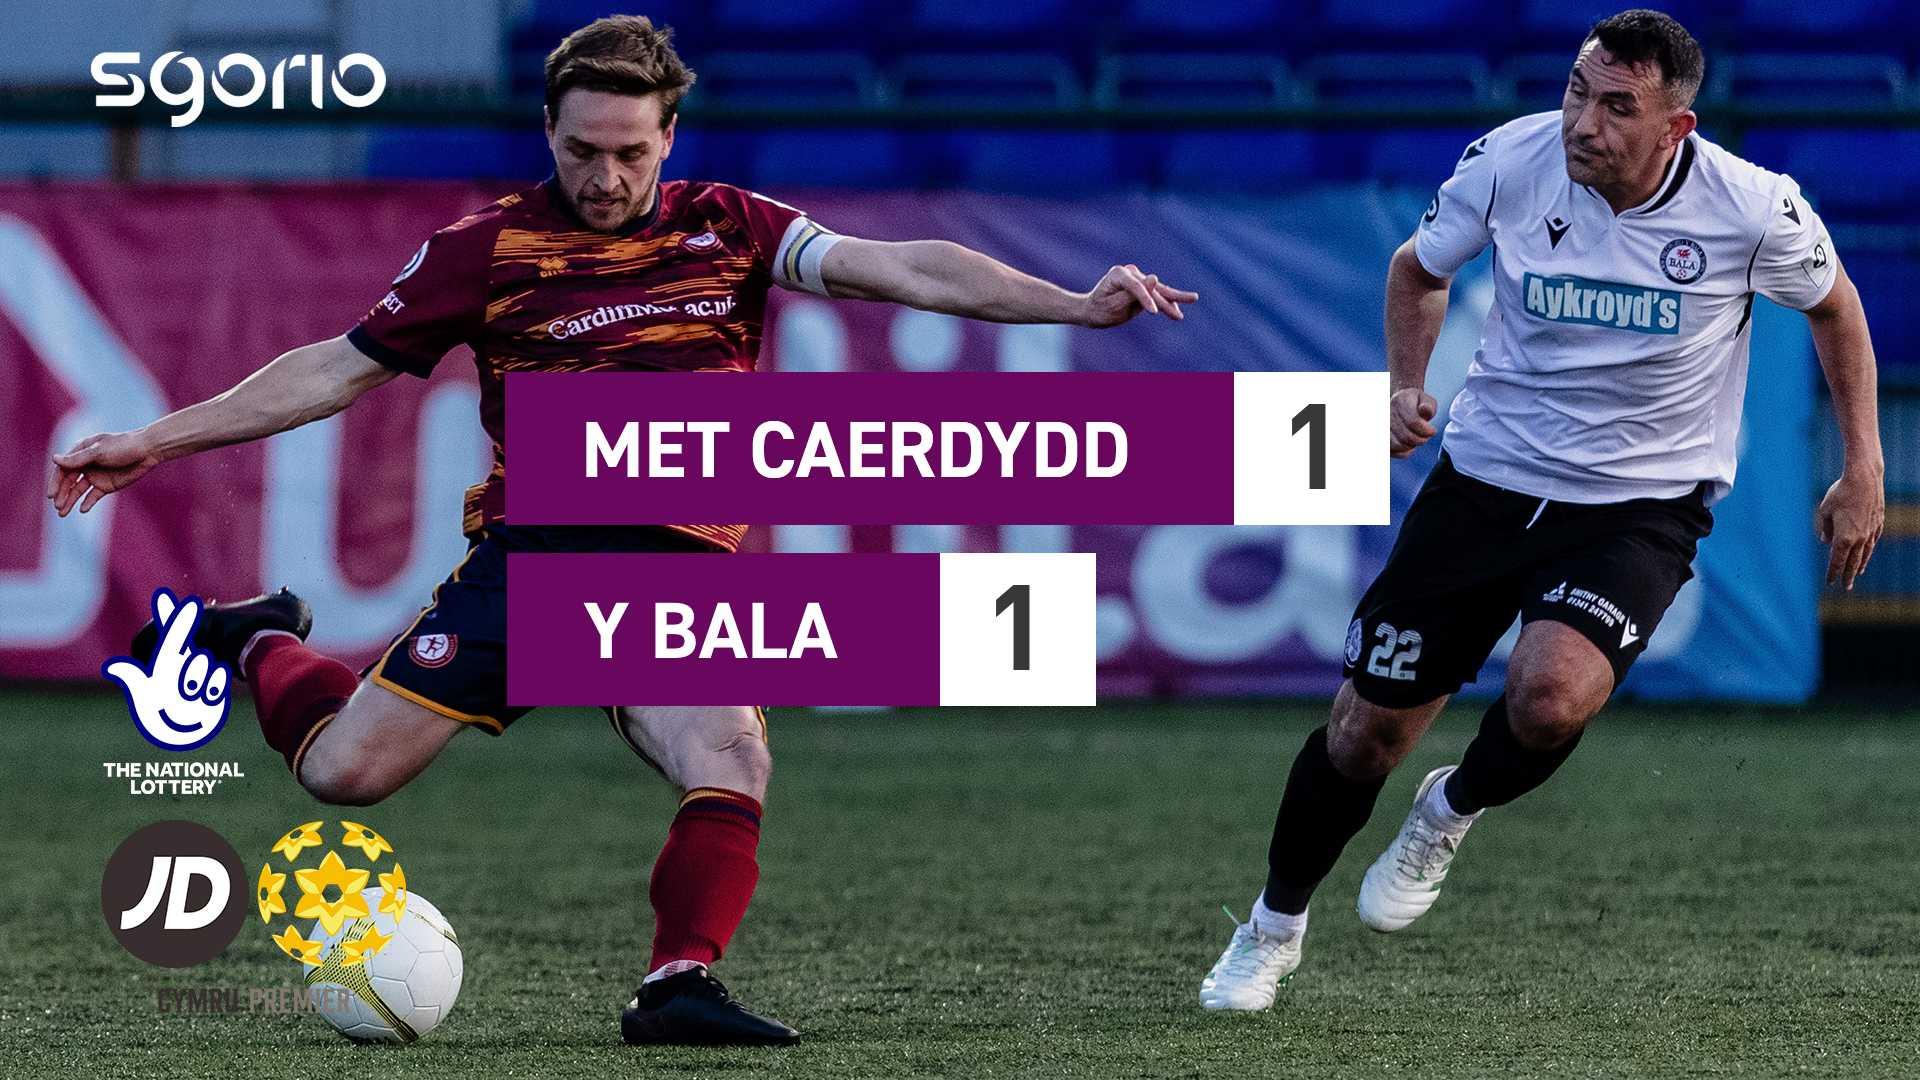 Met Caerdydd 1-1 Y Bala